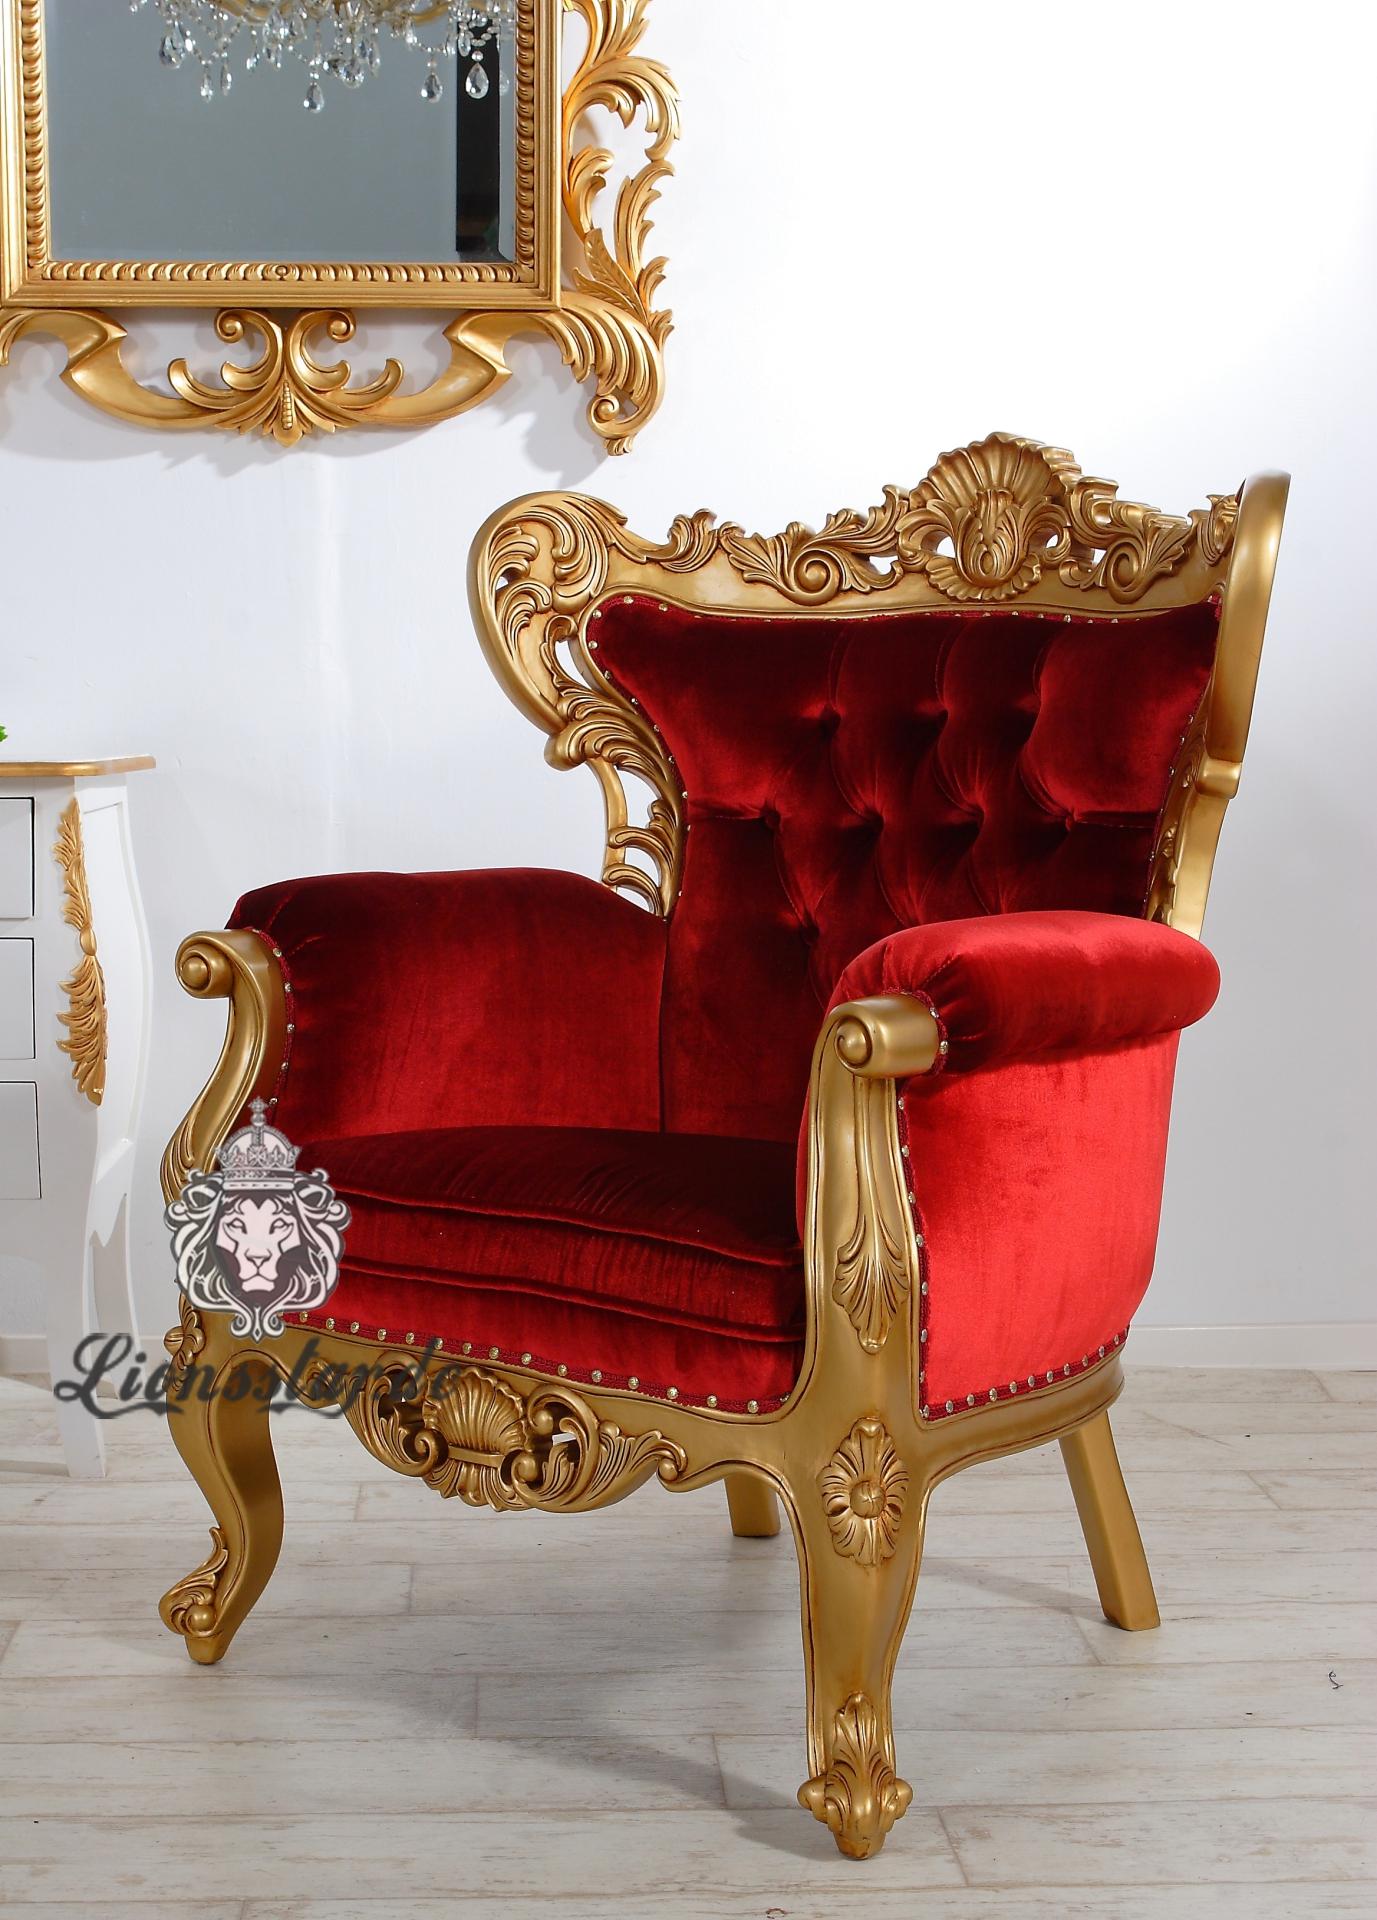 Luxus Sessel Königsstuhl Thronstuhl Kingchair Gold Rot